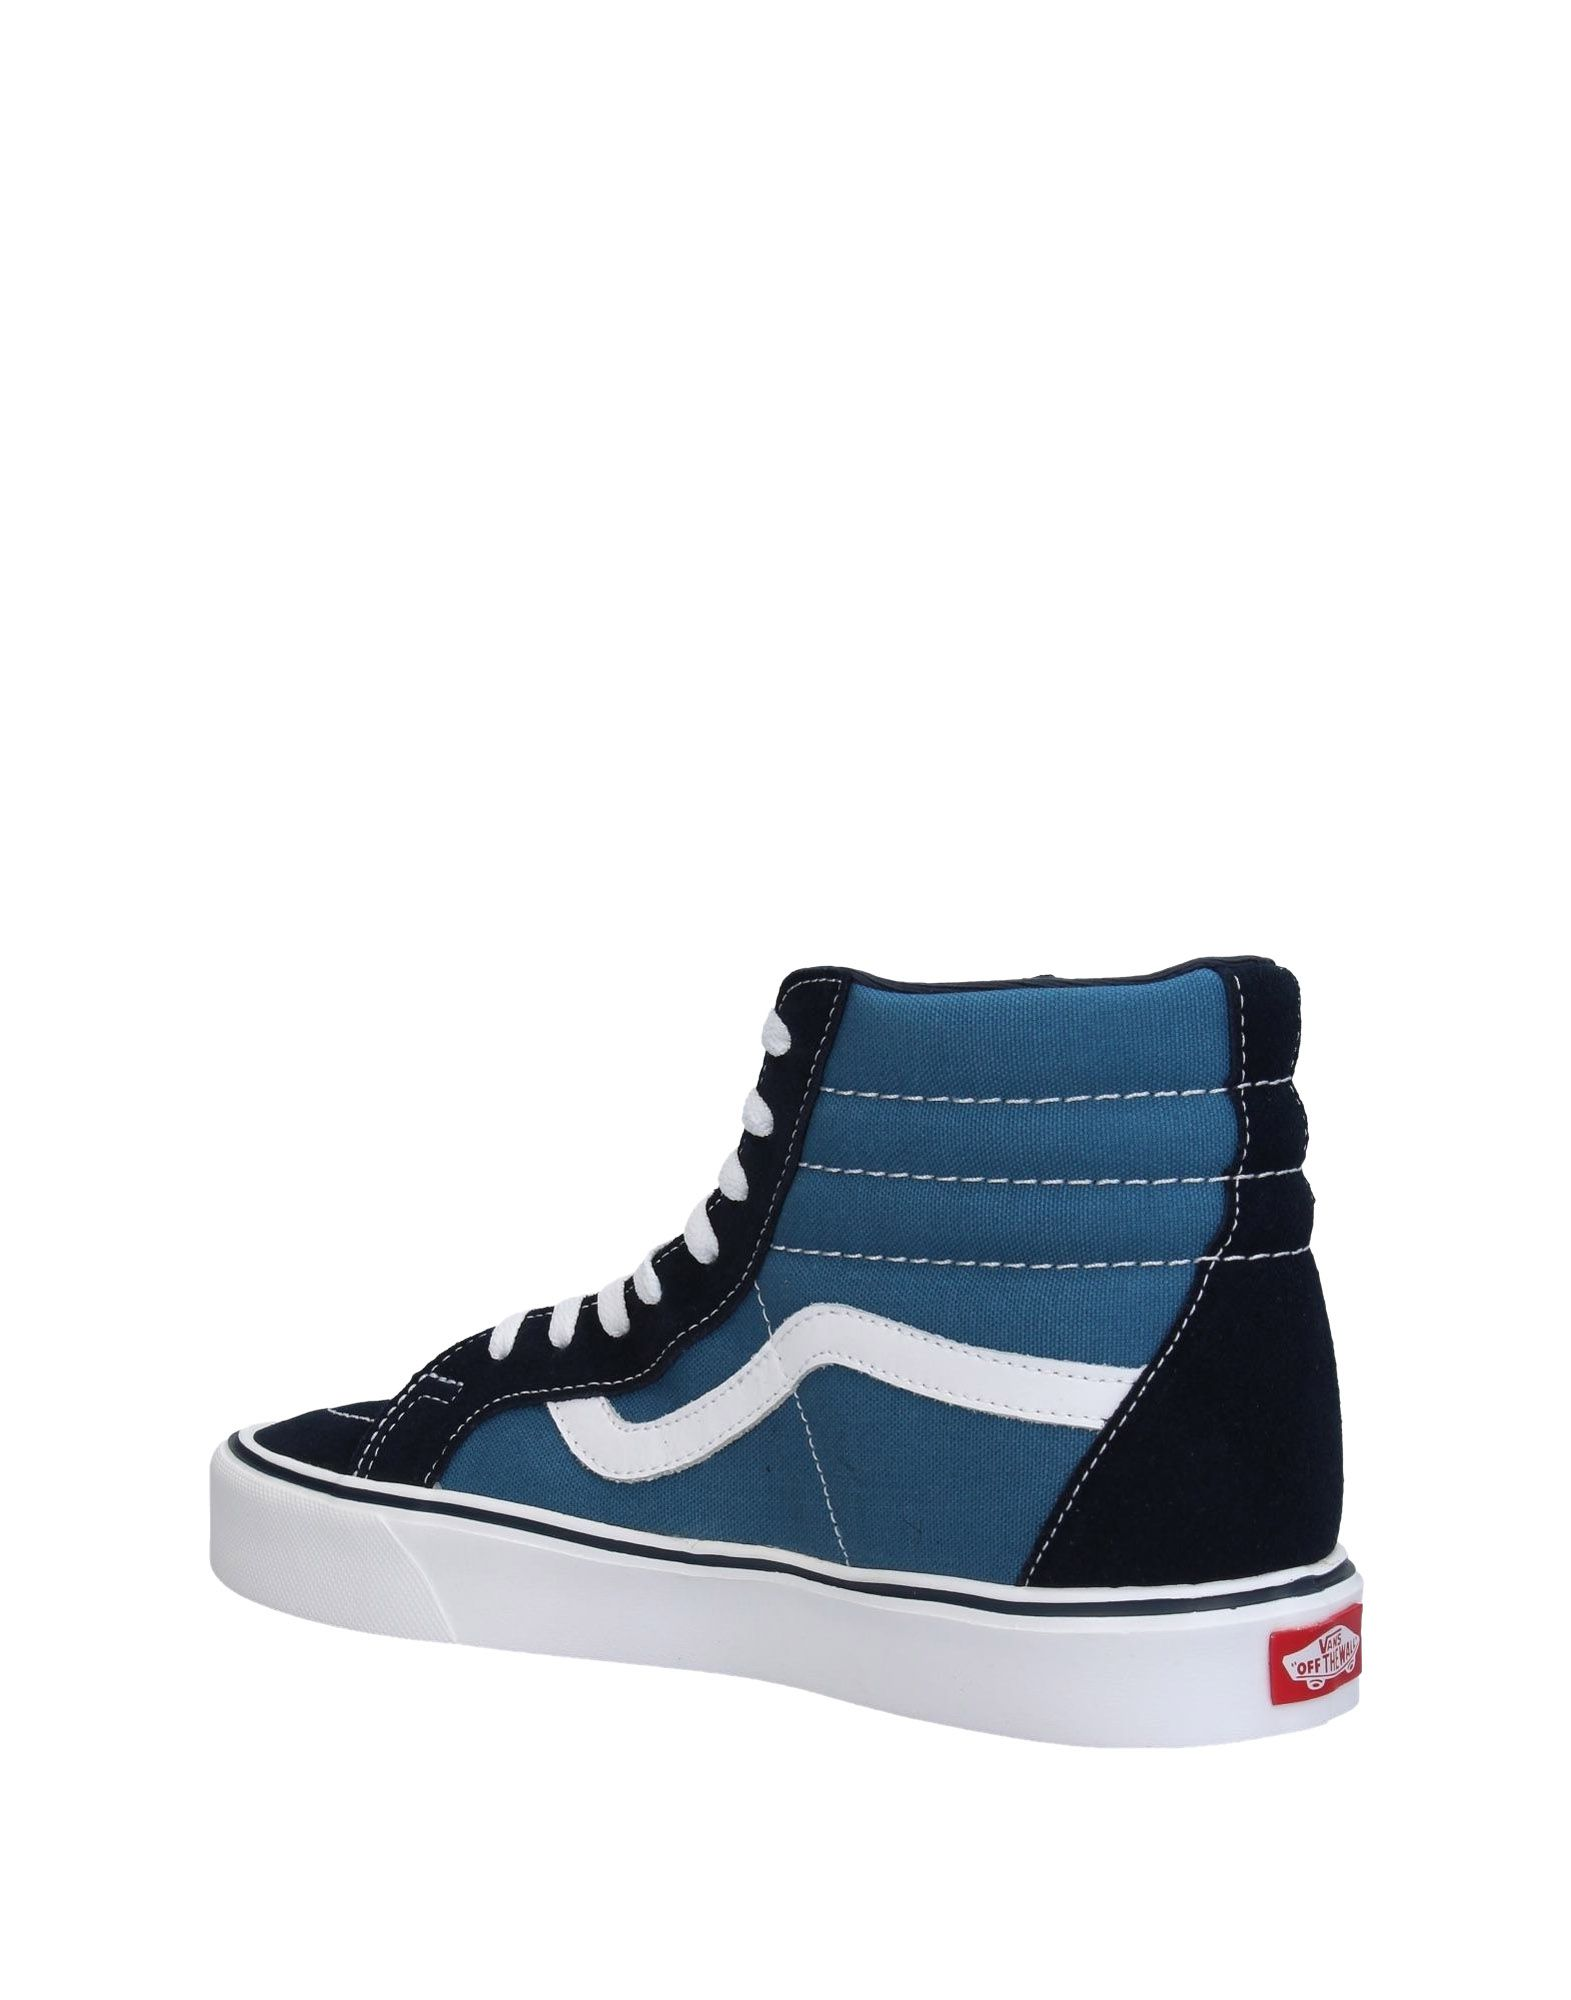 Moda Sneakers Sneakers Moda Vans Uomo - 11378483IQ 5a9c93